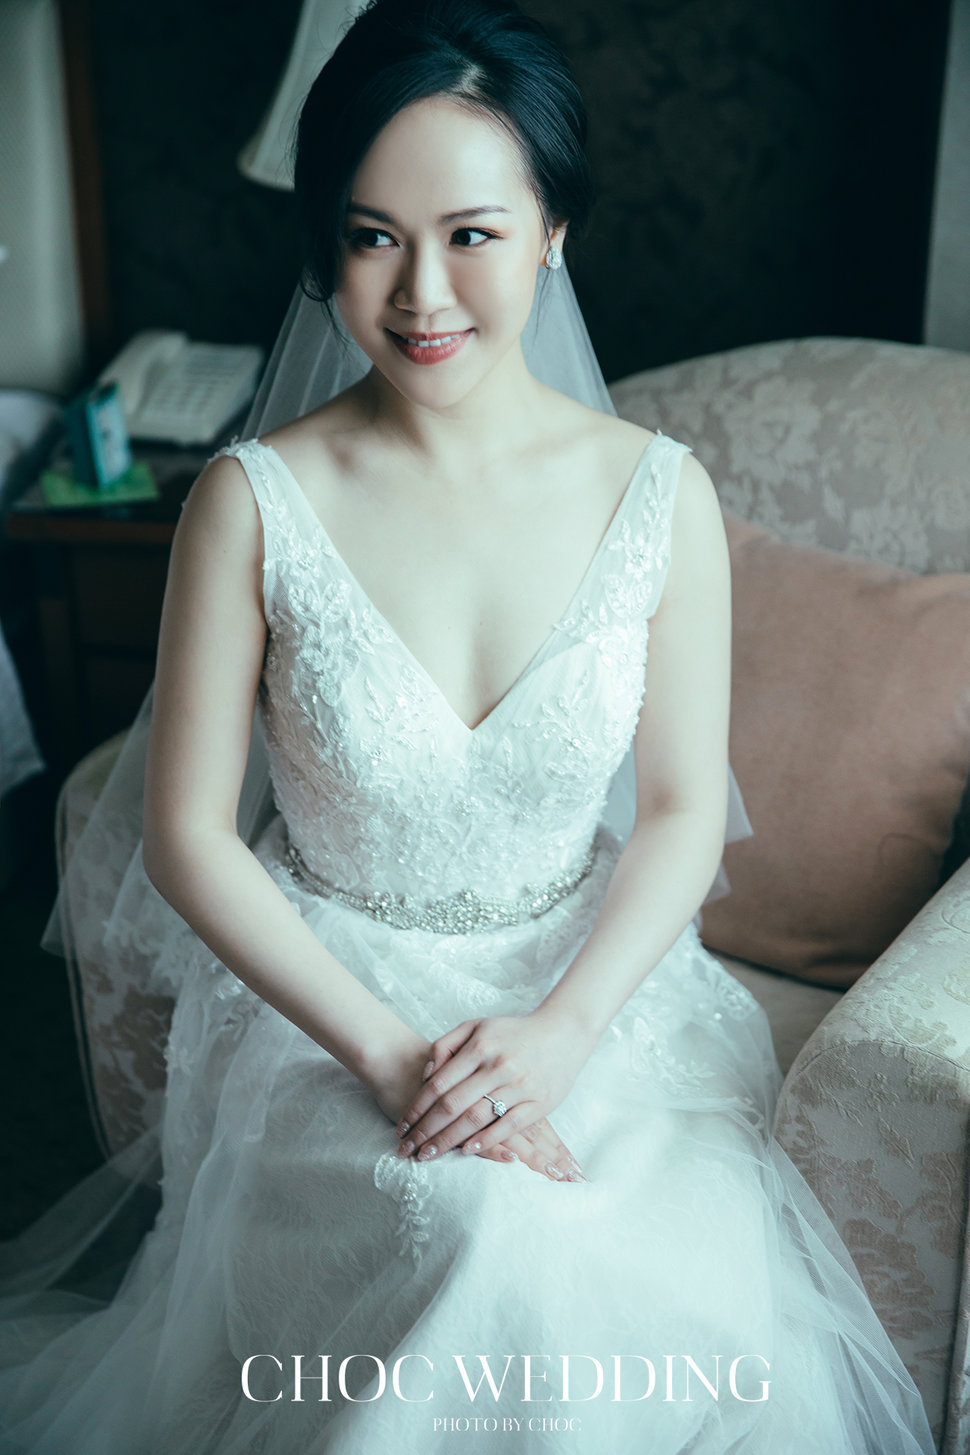 _25P1462 - CHOC wedding《結婚吧》